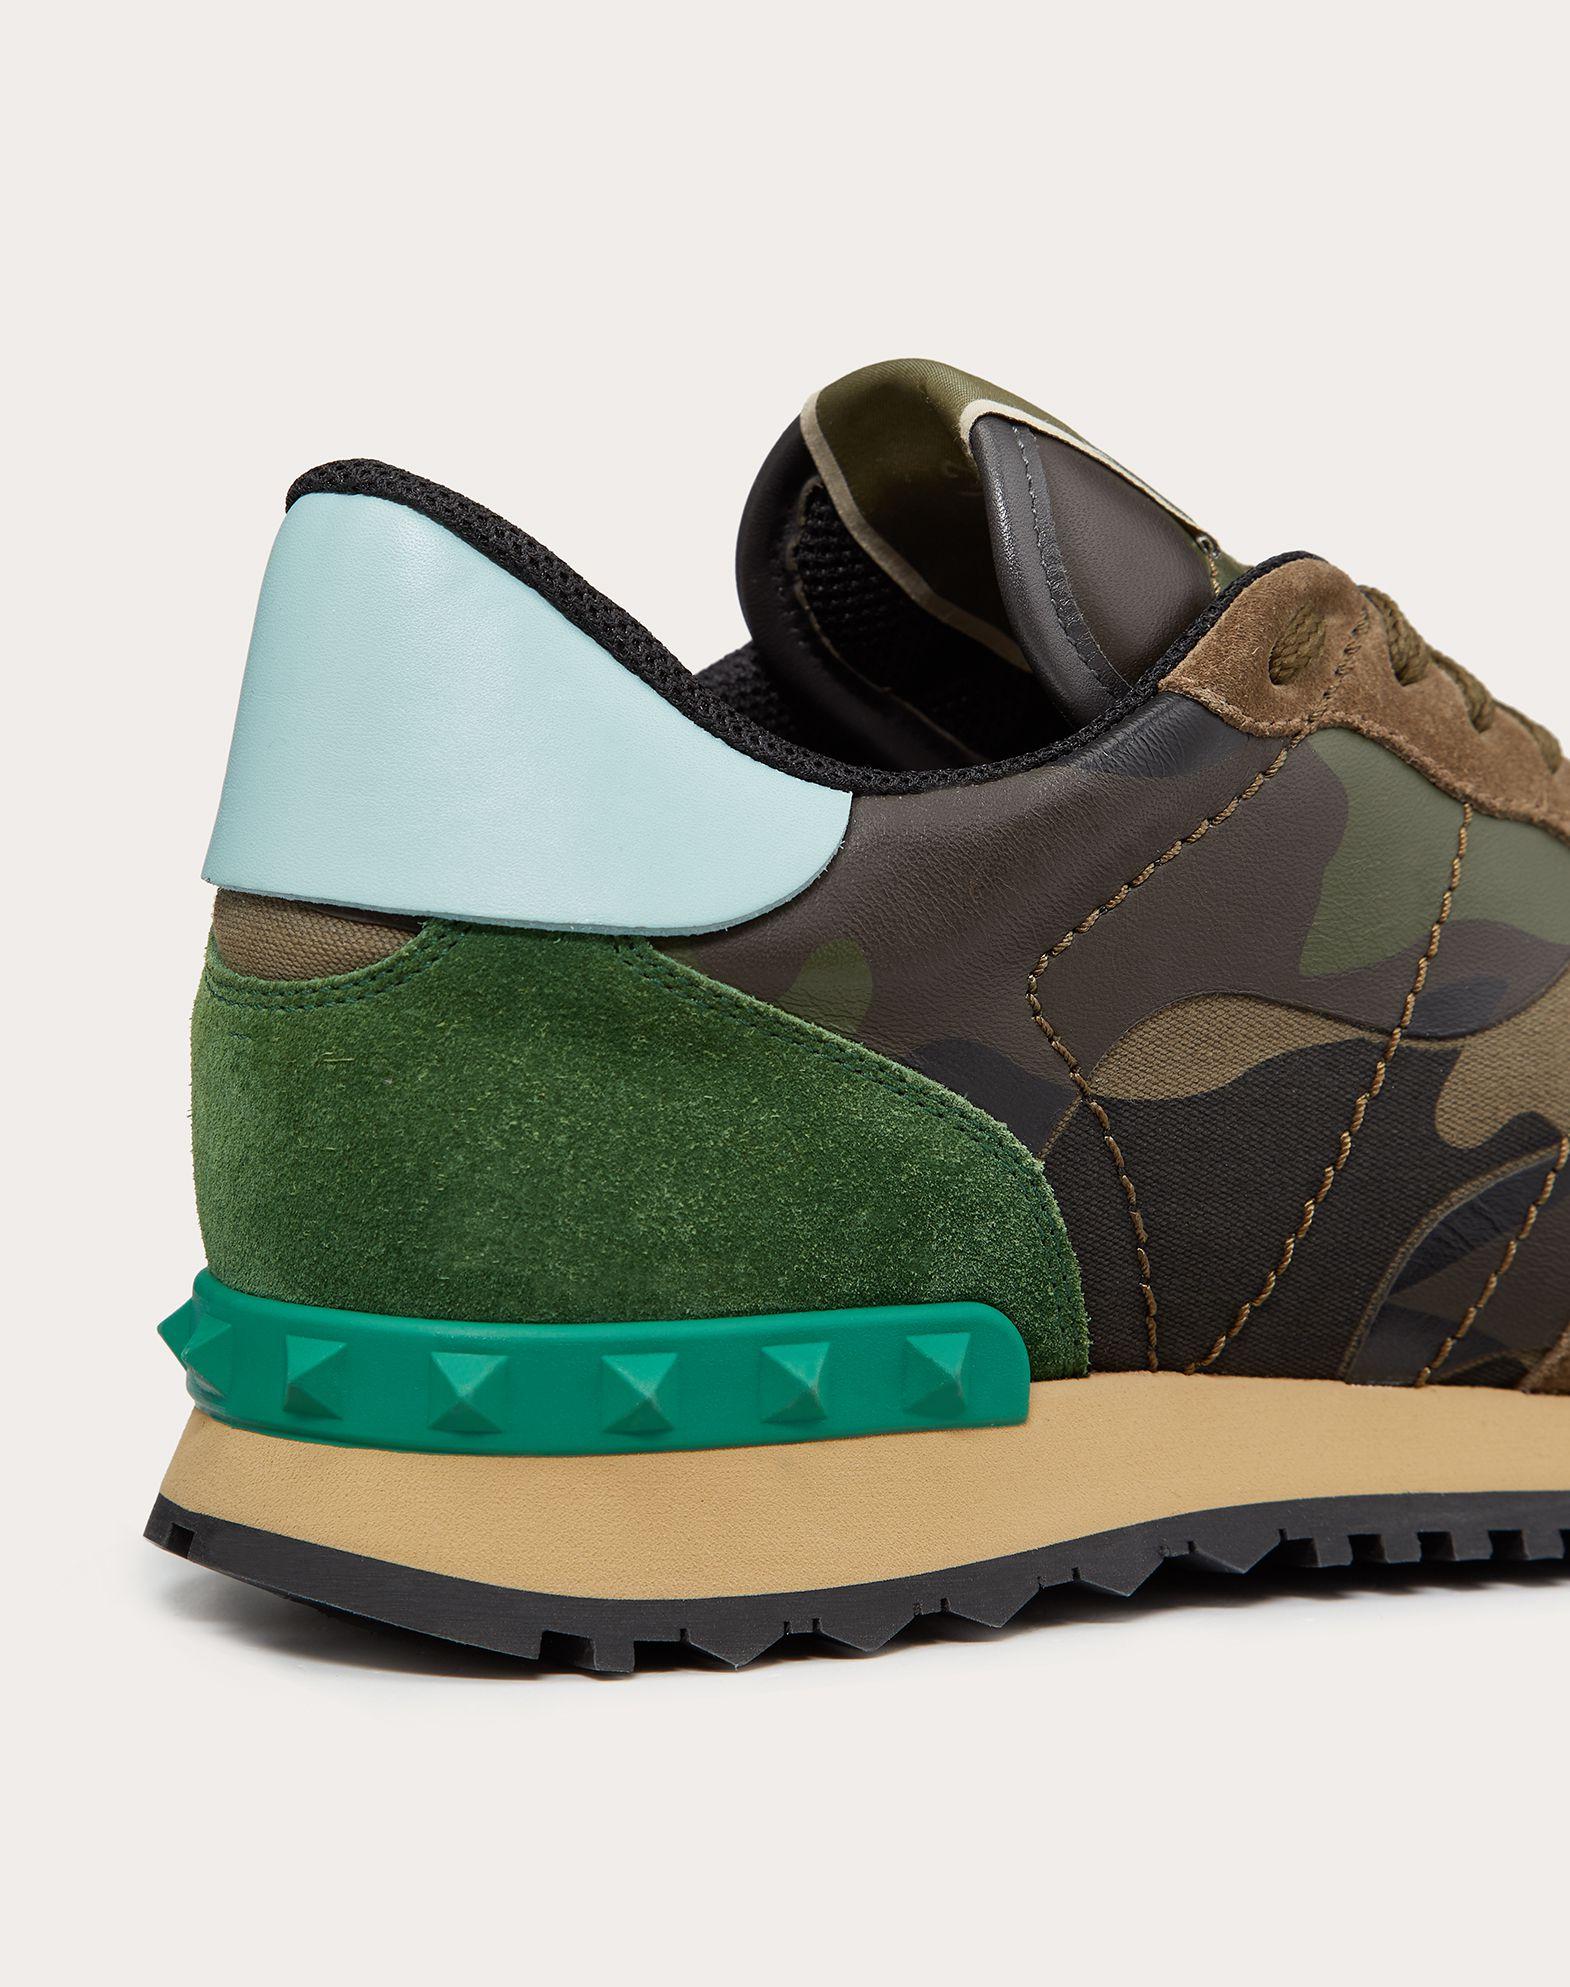 VALENTINO GARAVANI UOMO Sneaker Rockrunner Camouflage LOW-TOP SNEAKERS U a